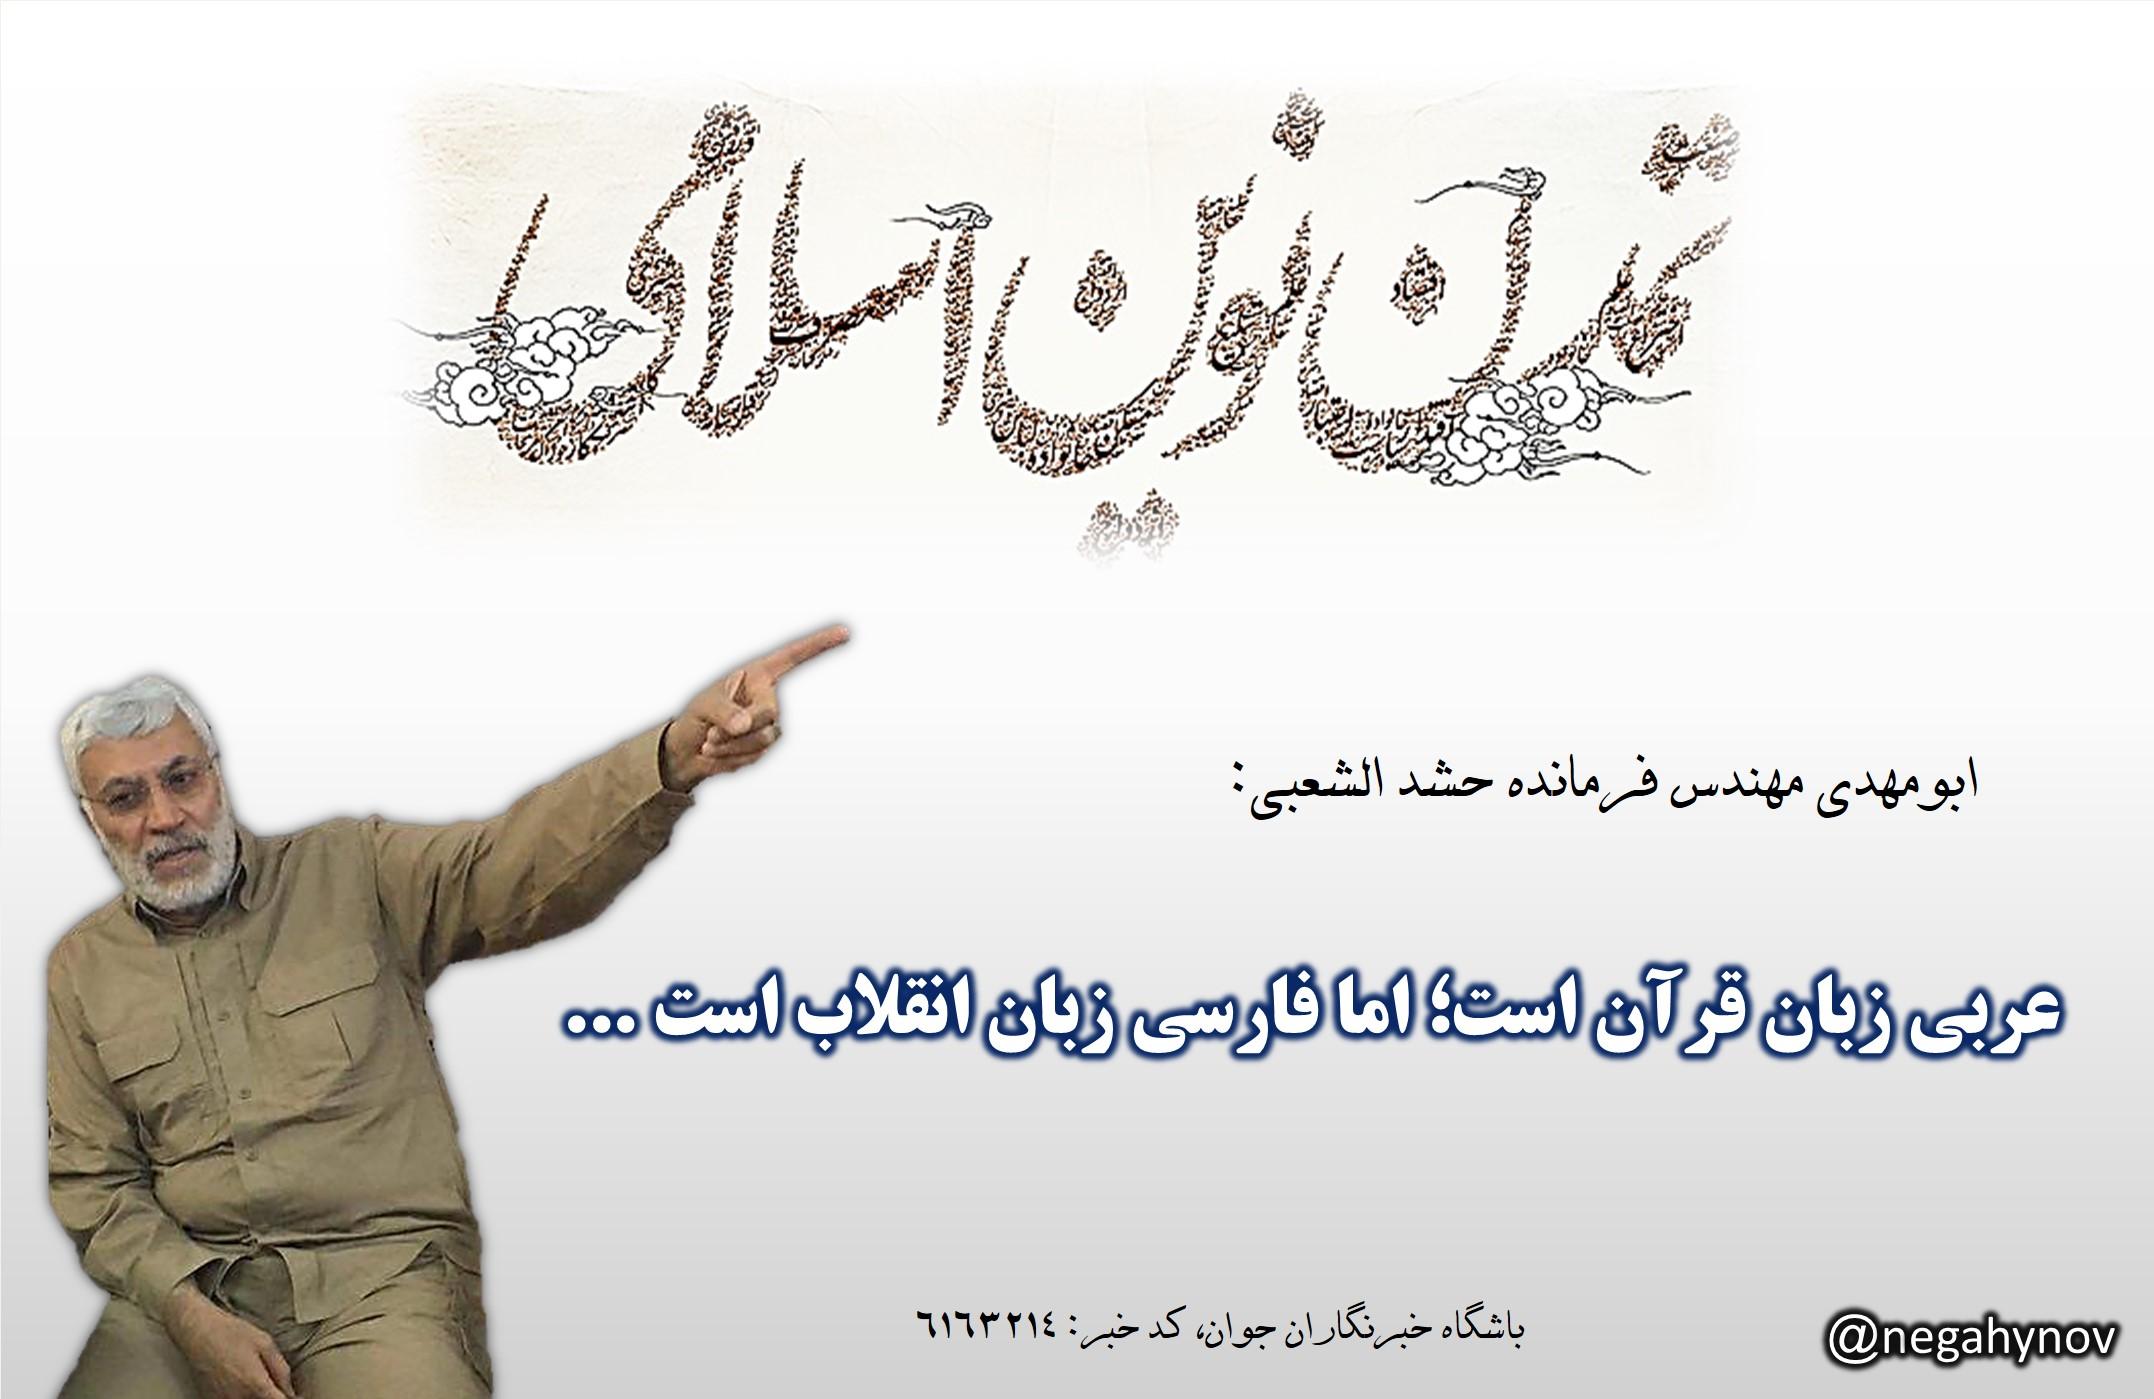 فارسی، زبان انقلاب - نگاهی نو